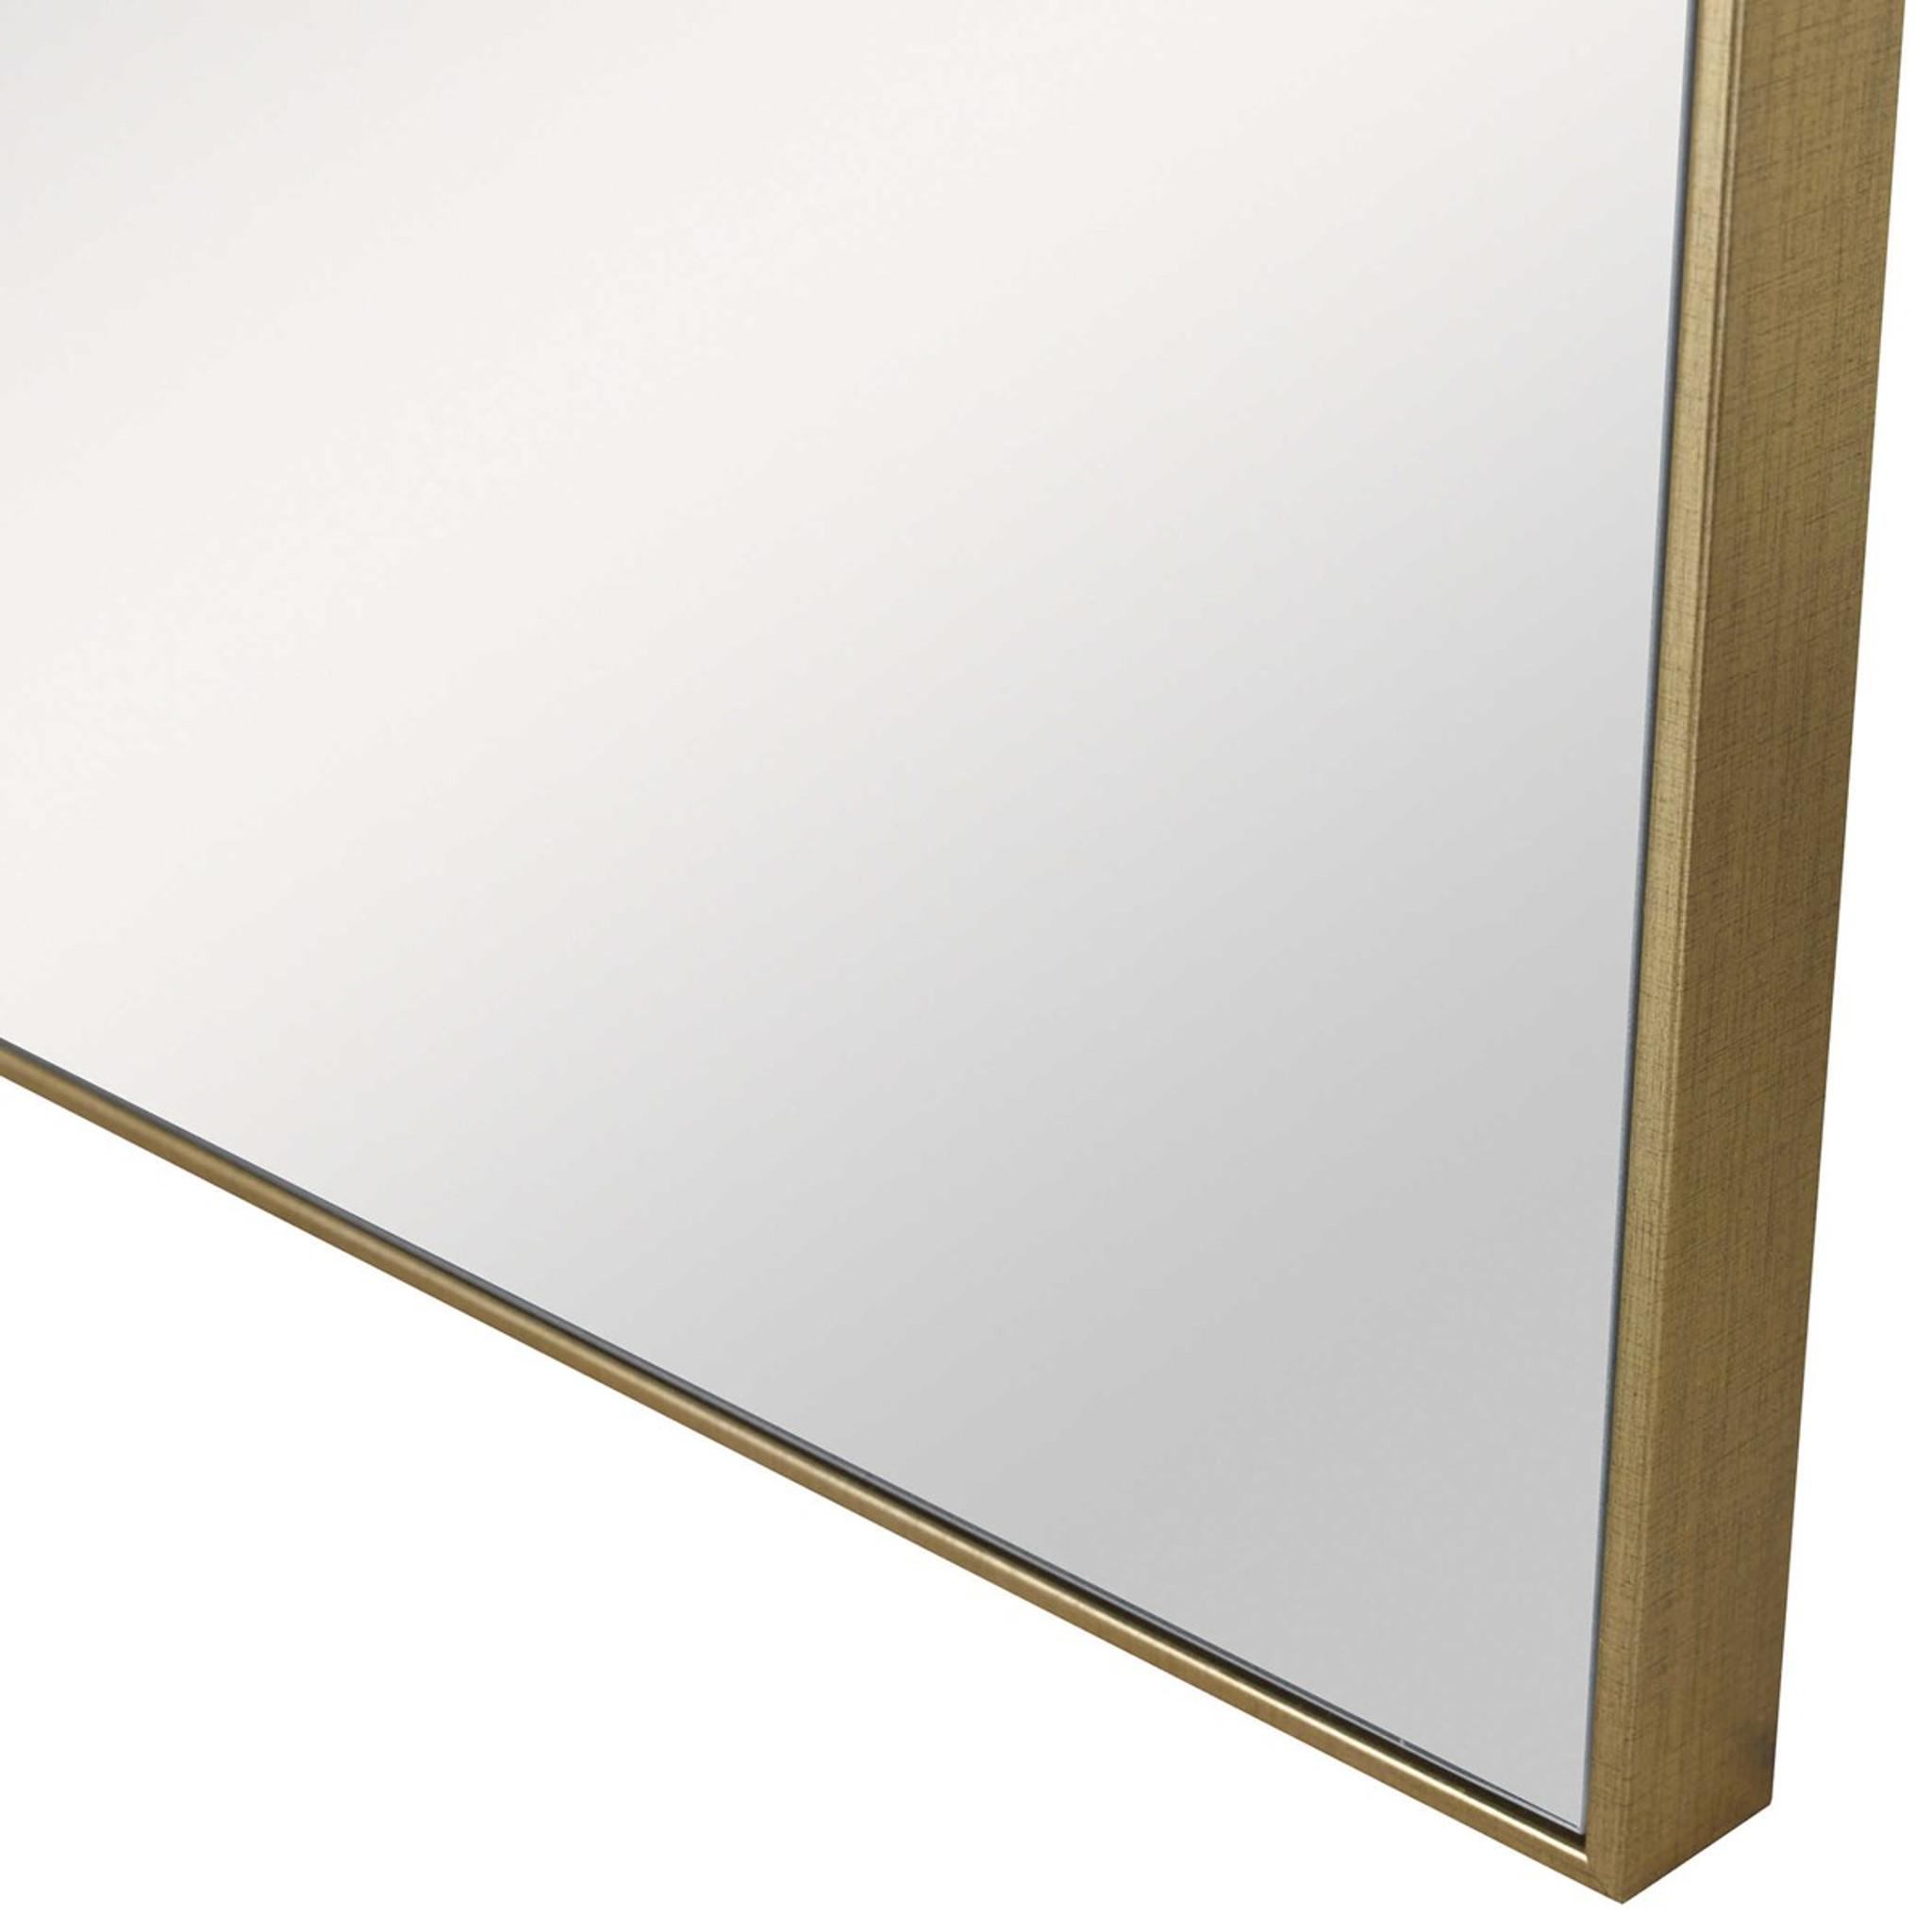 uttermost alexo gold modern square simple metal edge frame wall mirror